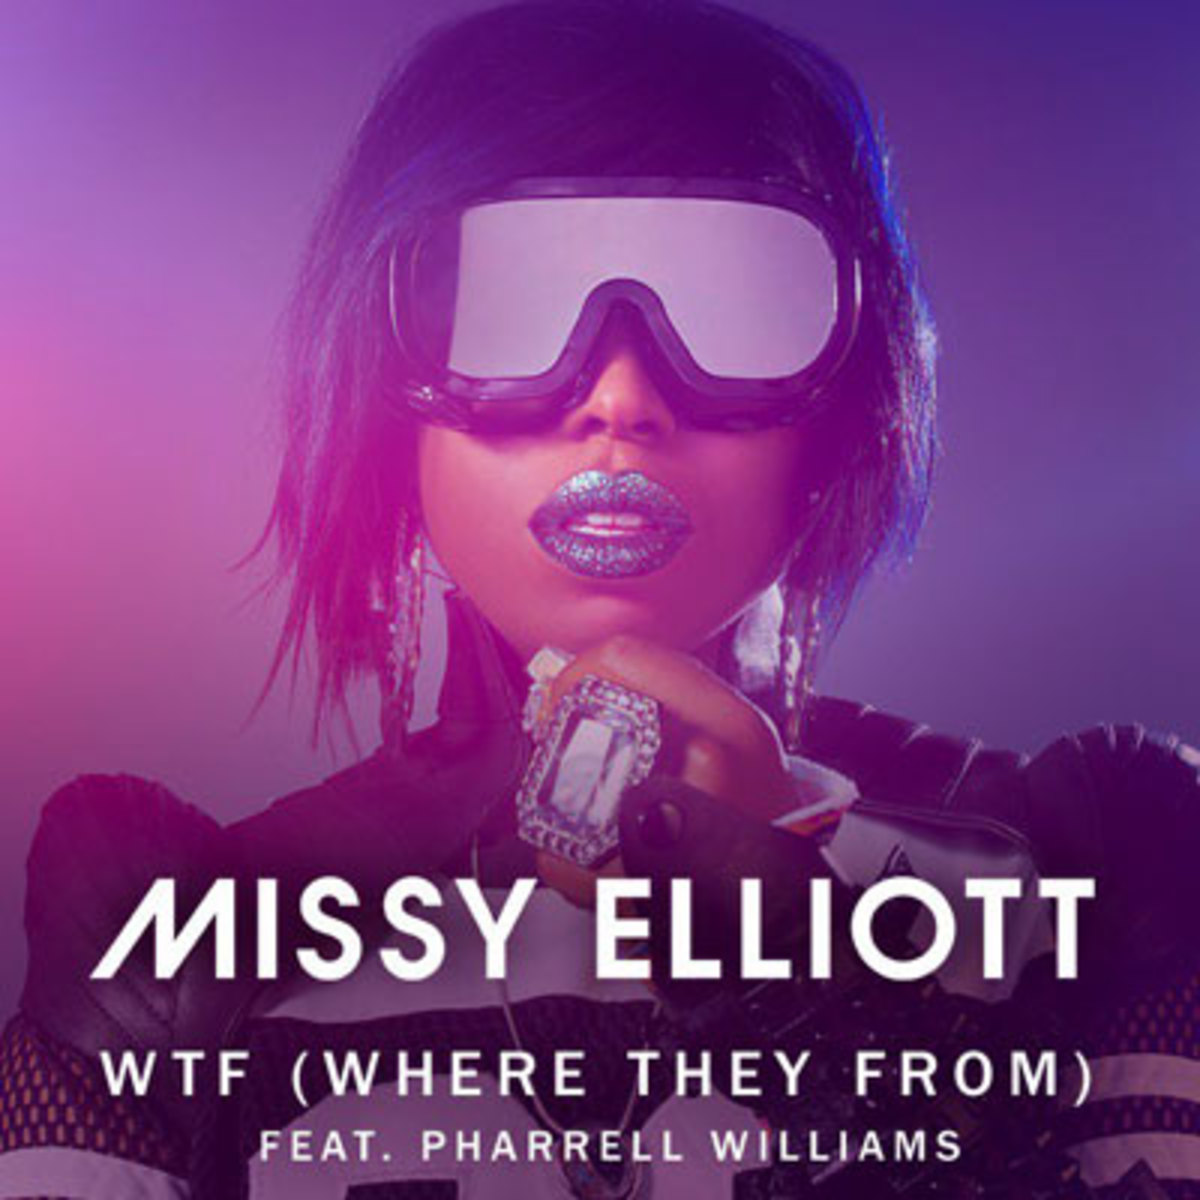 missy-elliot-wtf.jpg